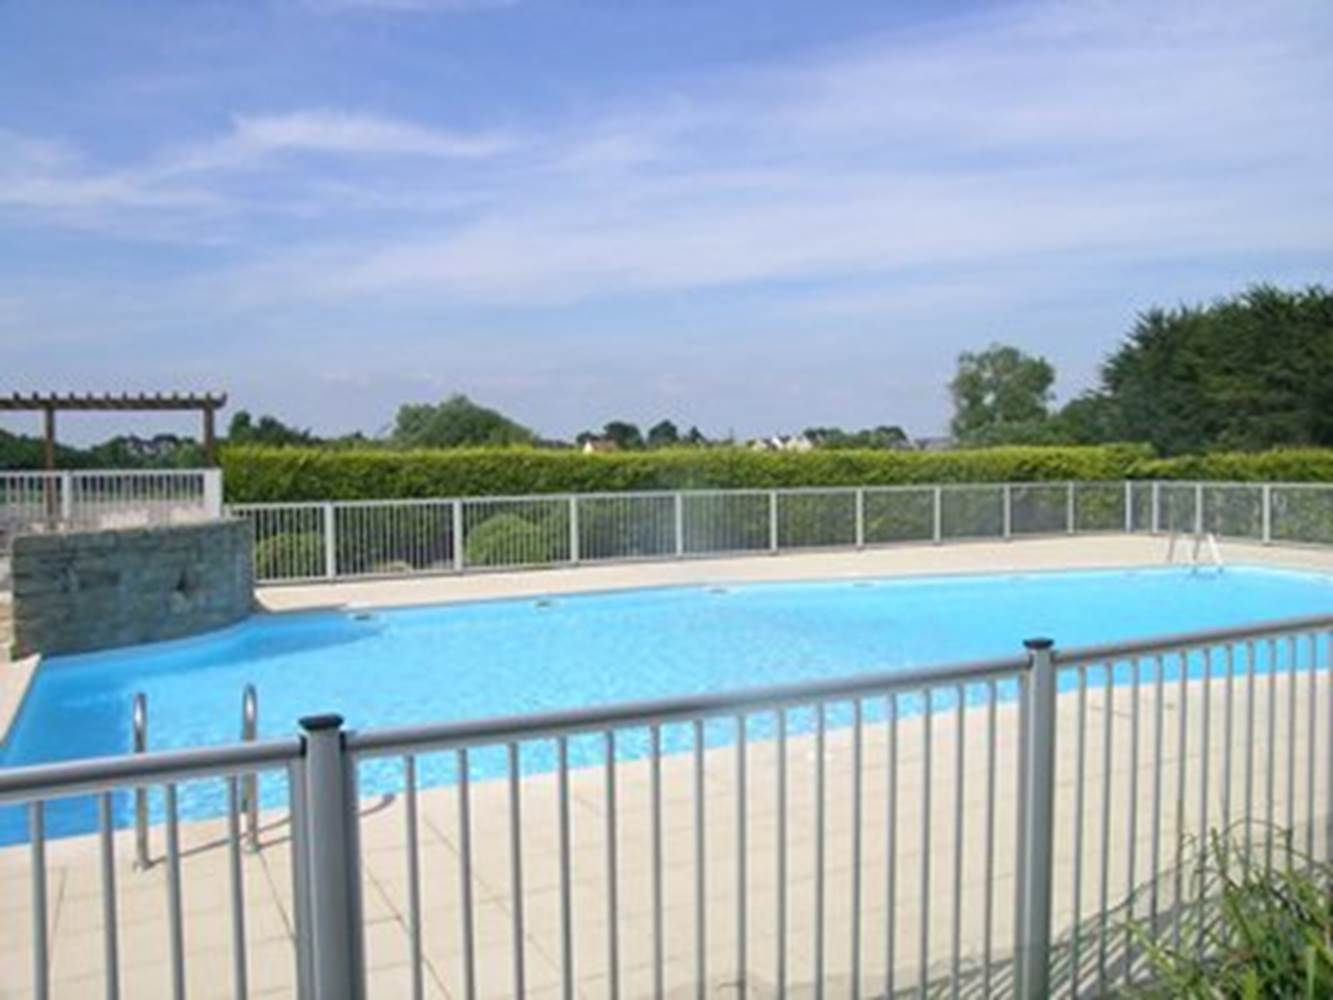 Square Habitat Etel - Maison Avec Piscine - 4246 - Erdeven dedans Camping Golf Du Morbihan Avec Piscine